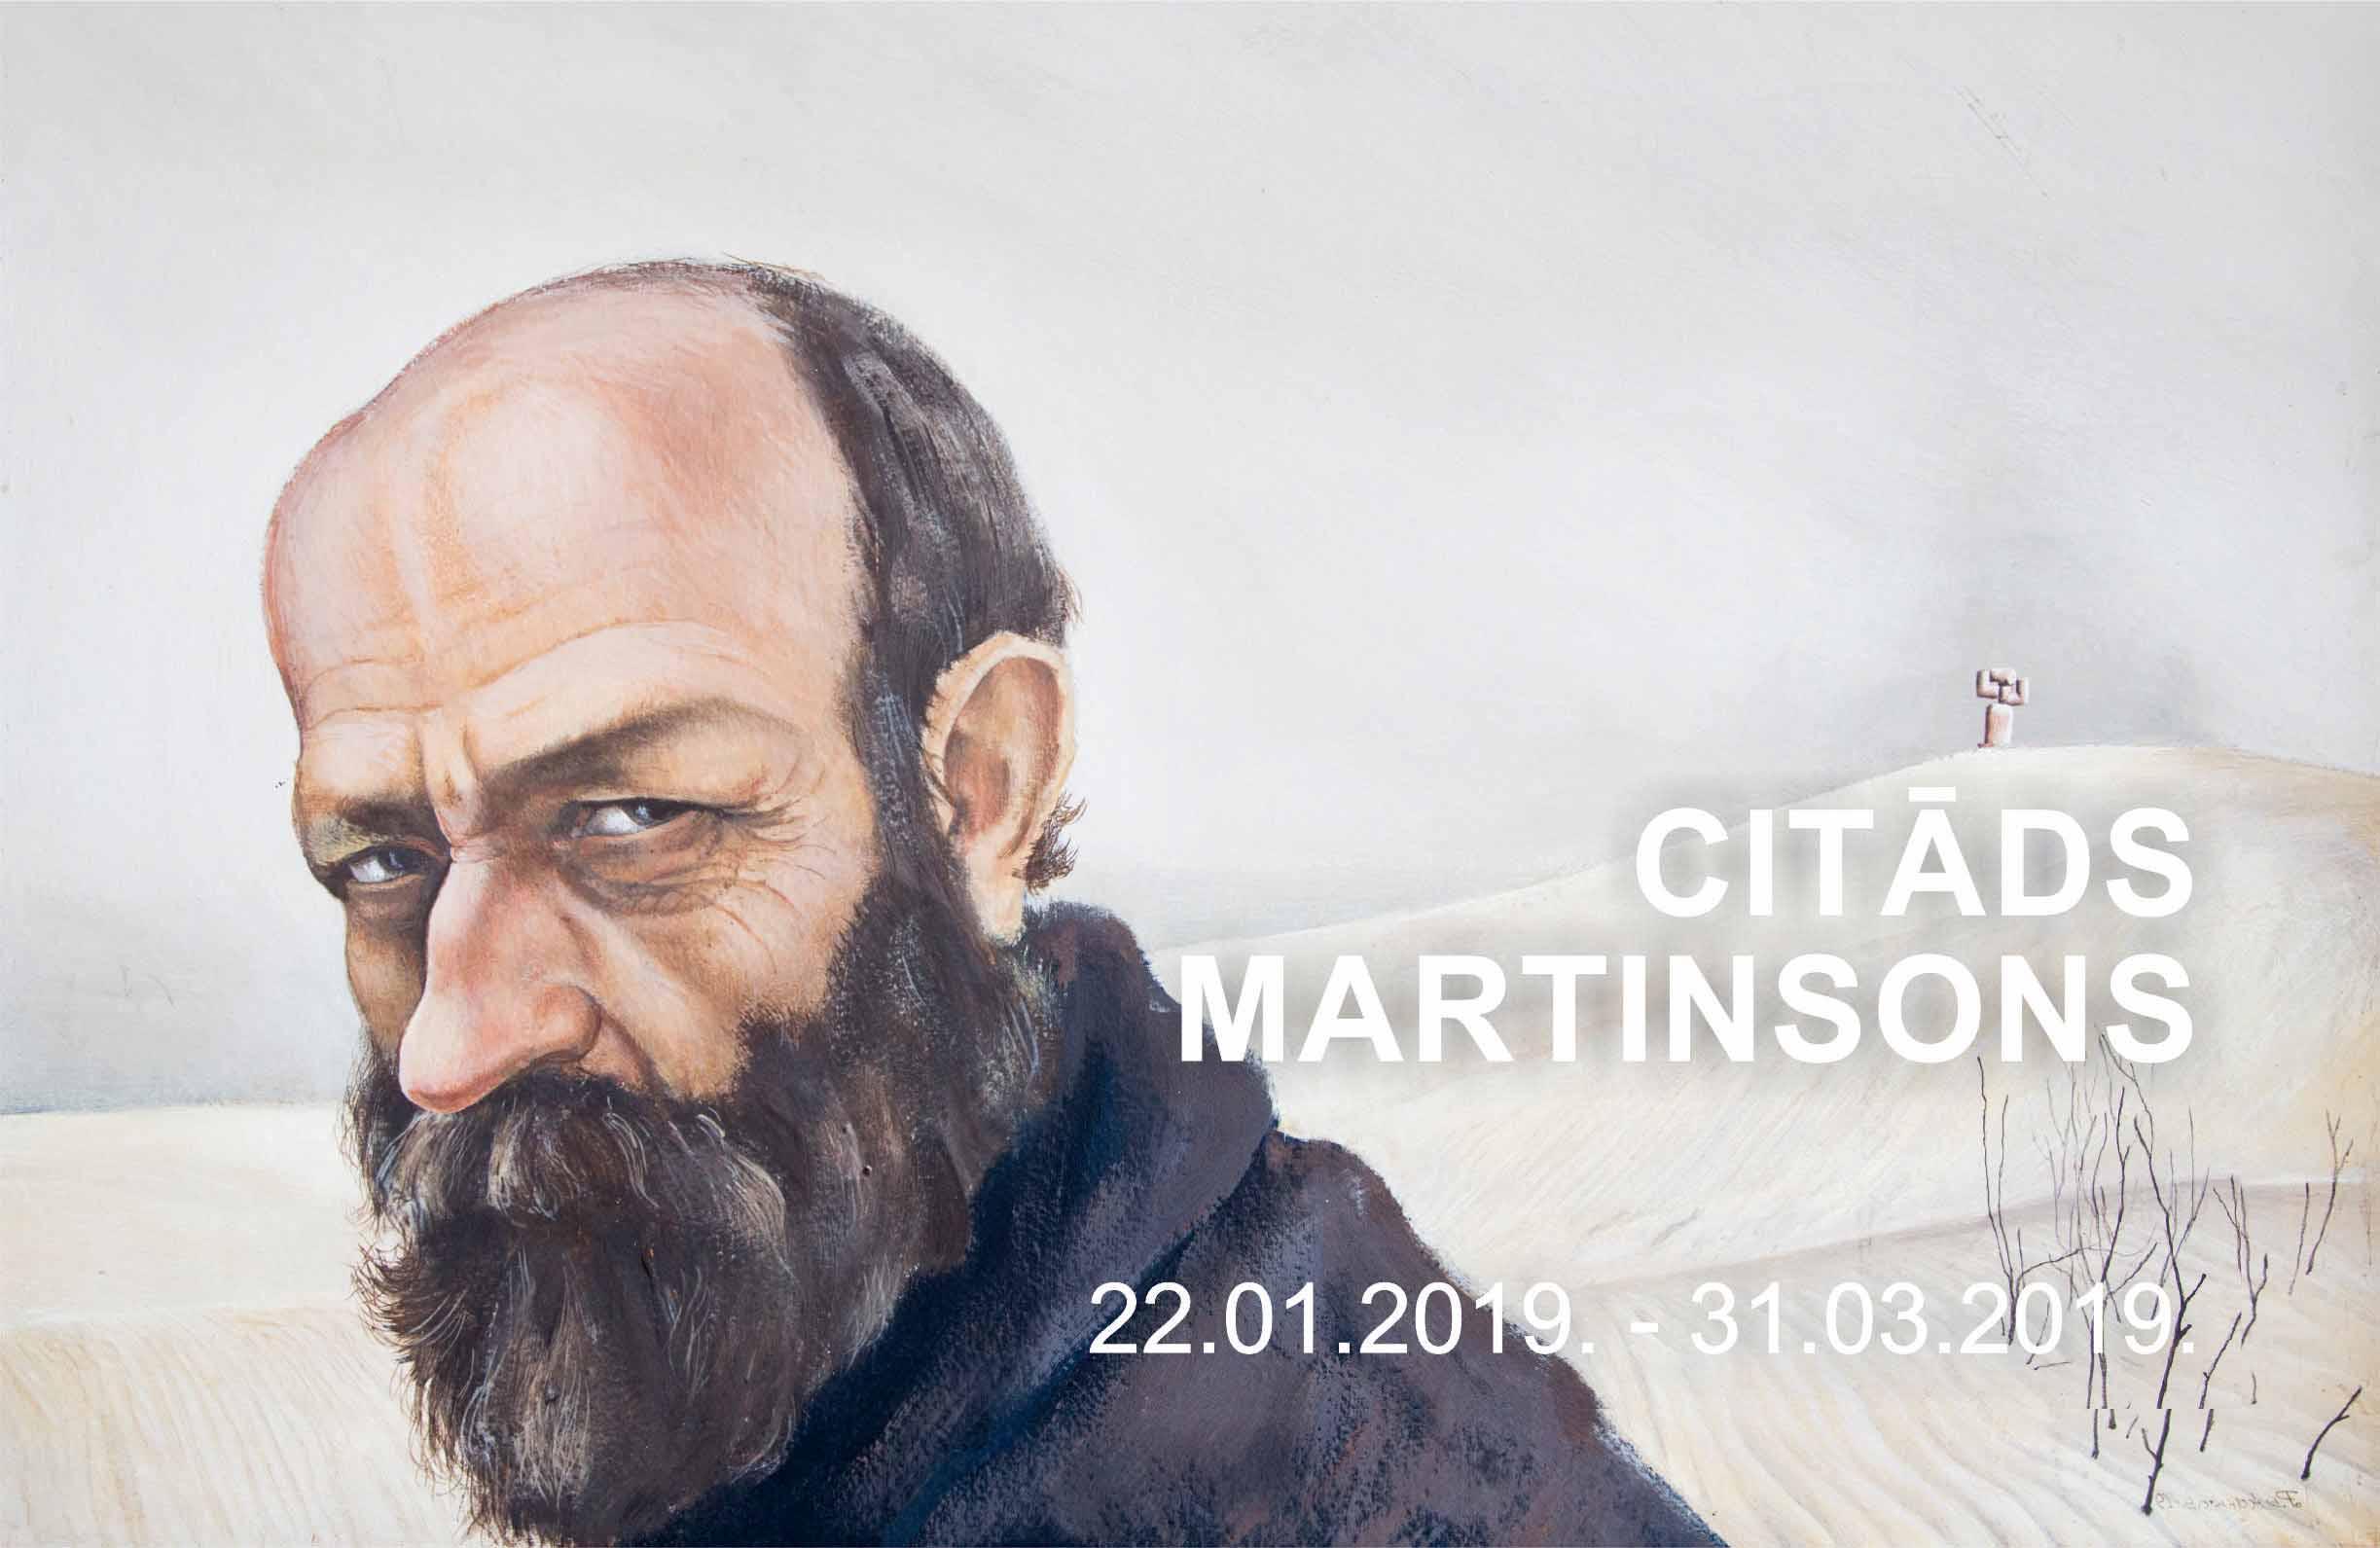 Citāds Martinsons